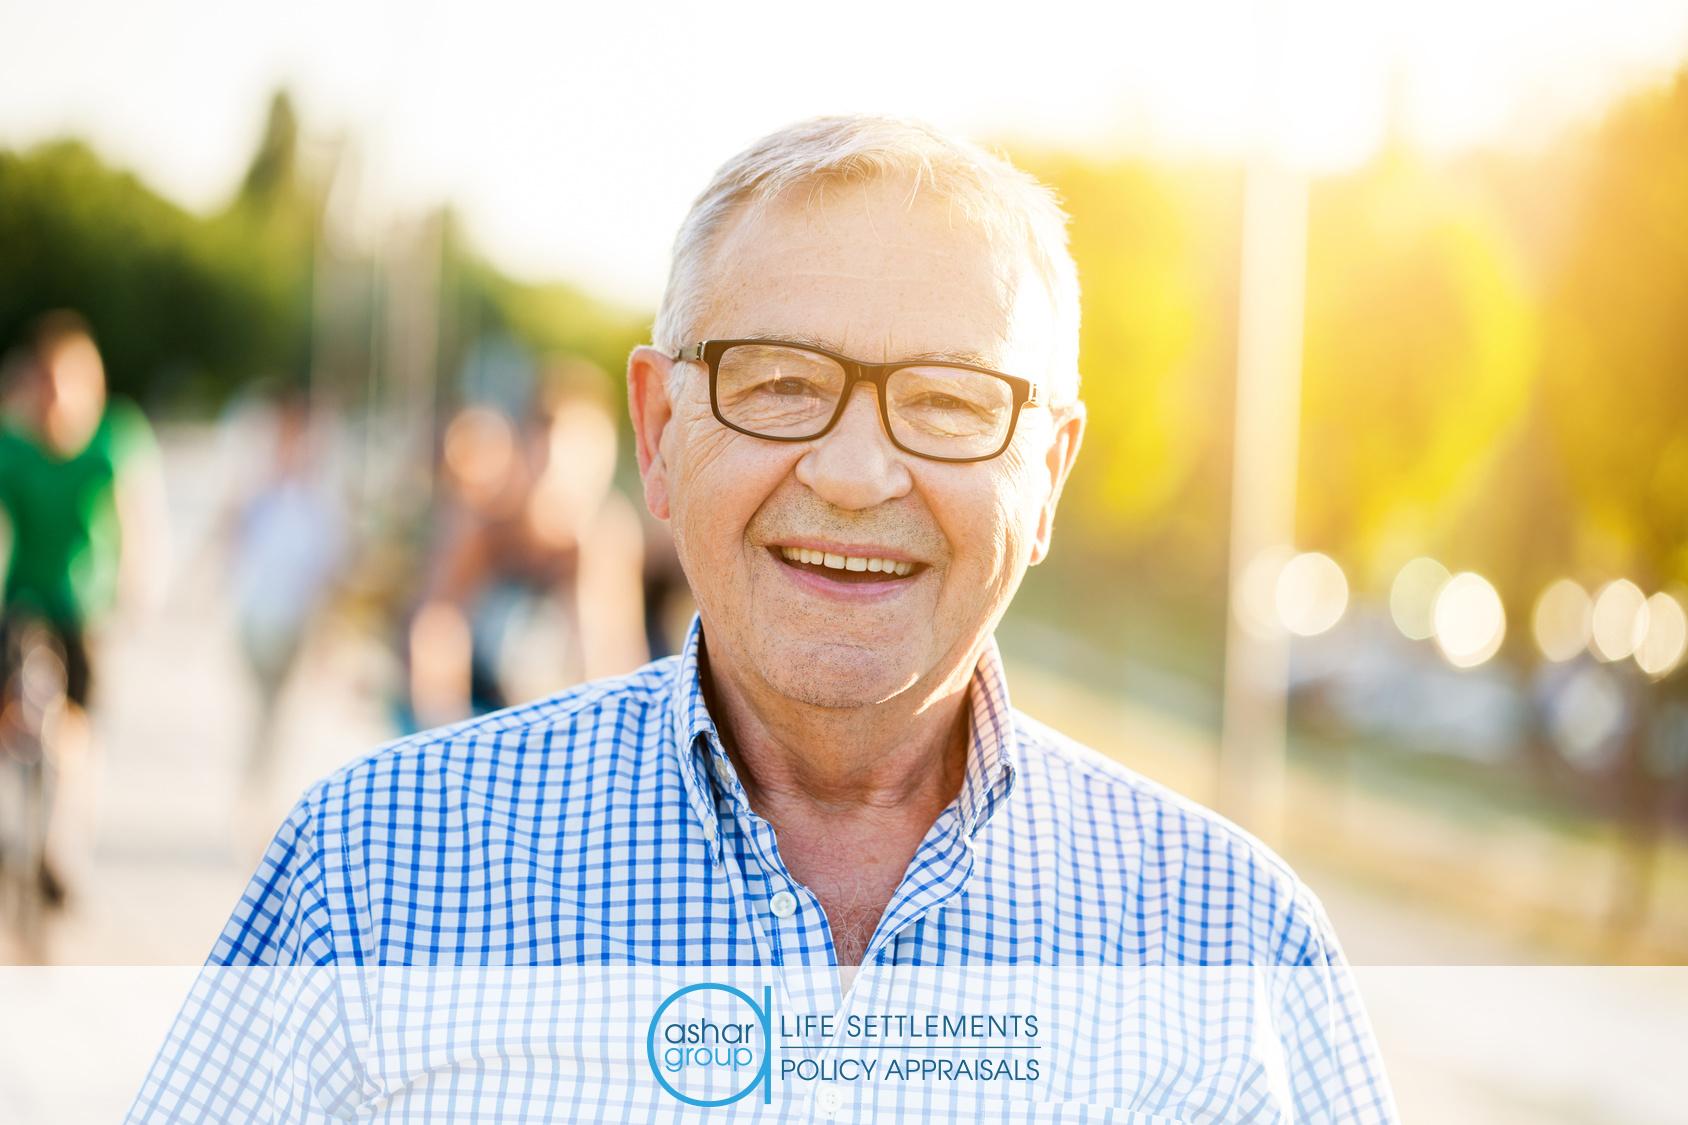 Smiling retired man on suburban street